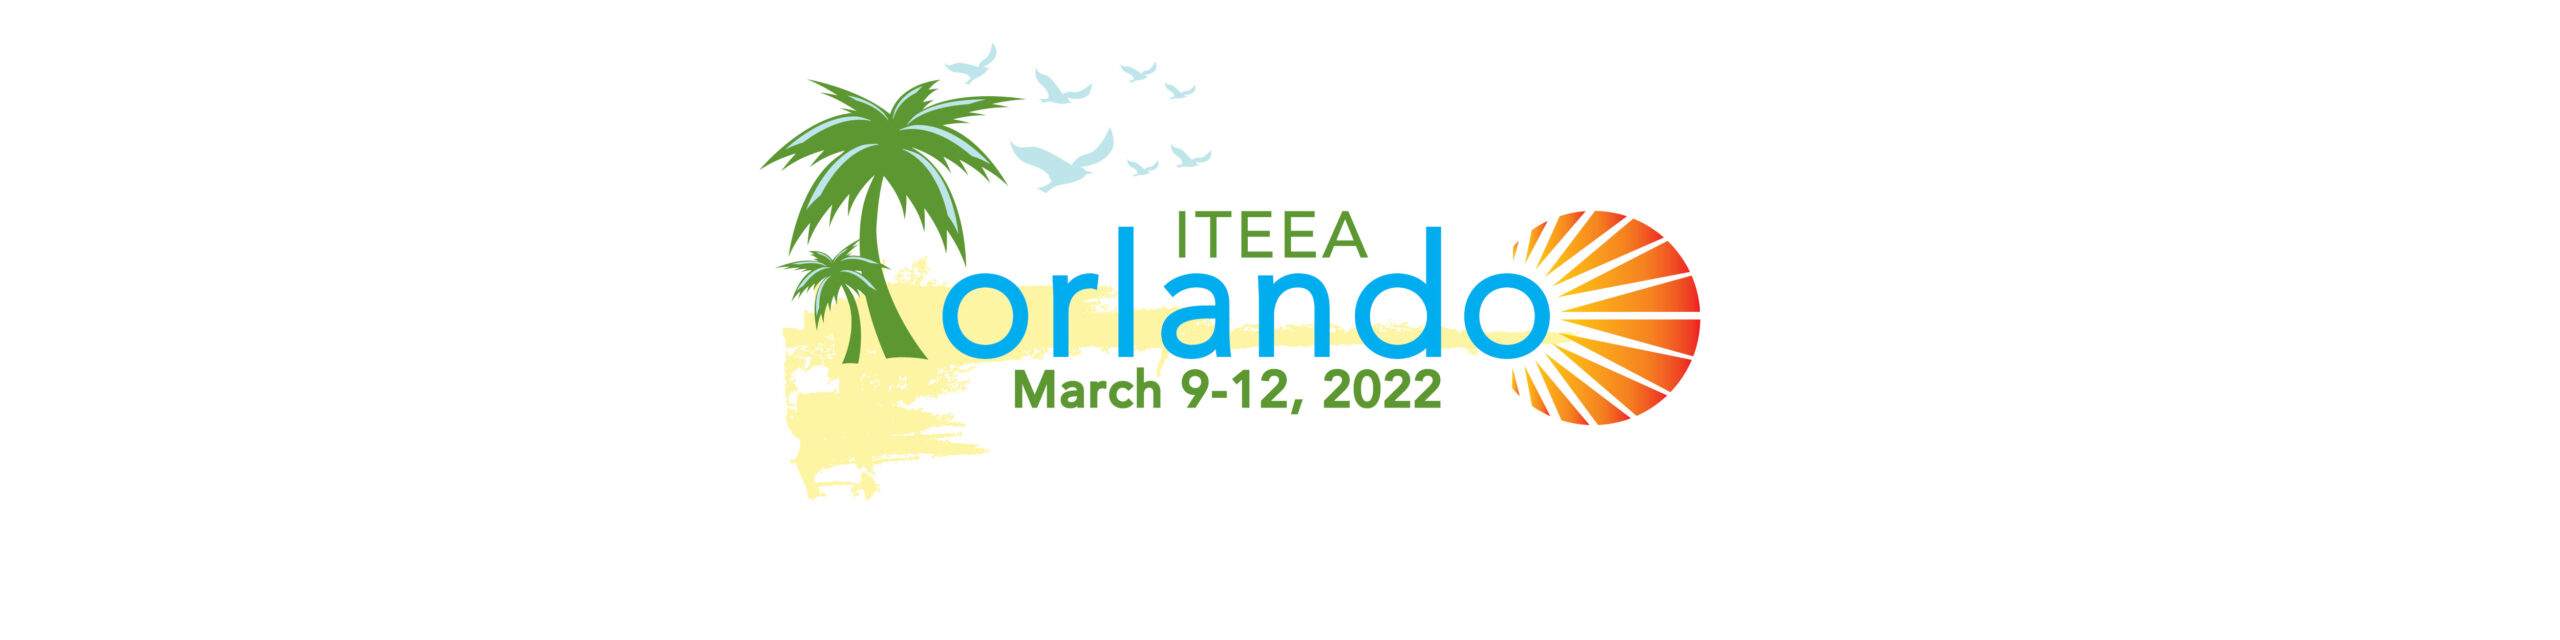 2022 ITEEA Annual Conference - Orlando, Florida